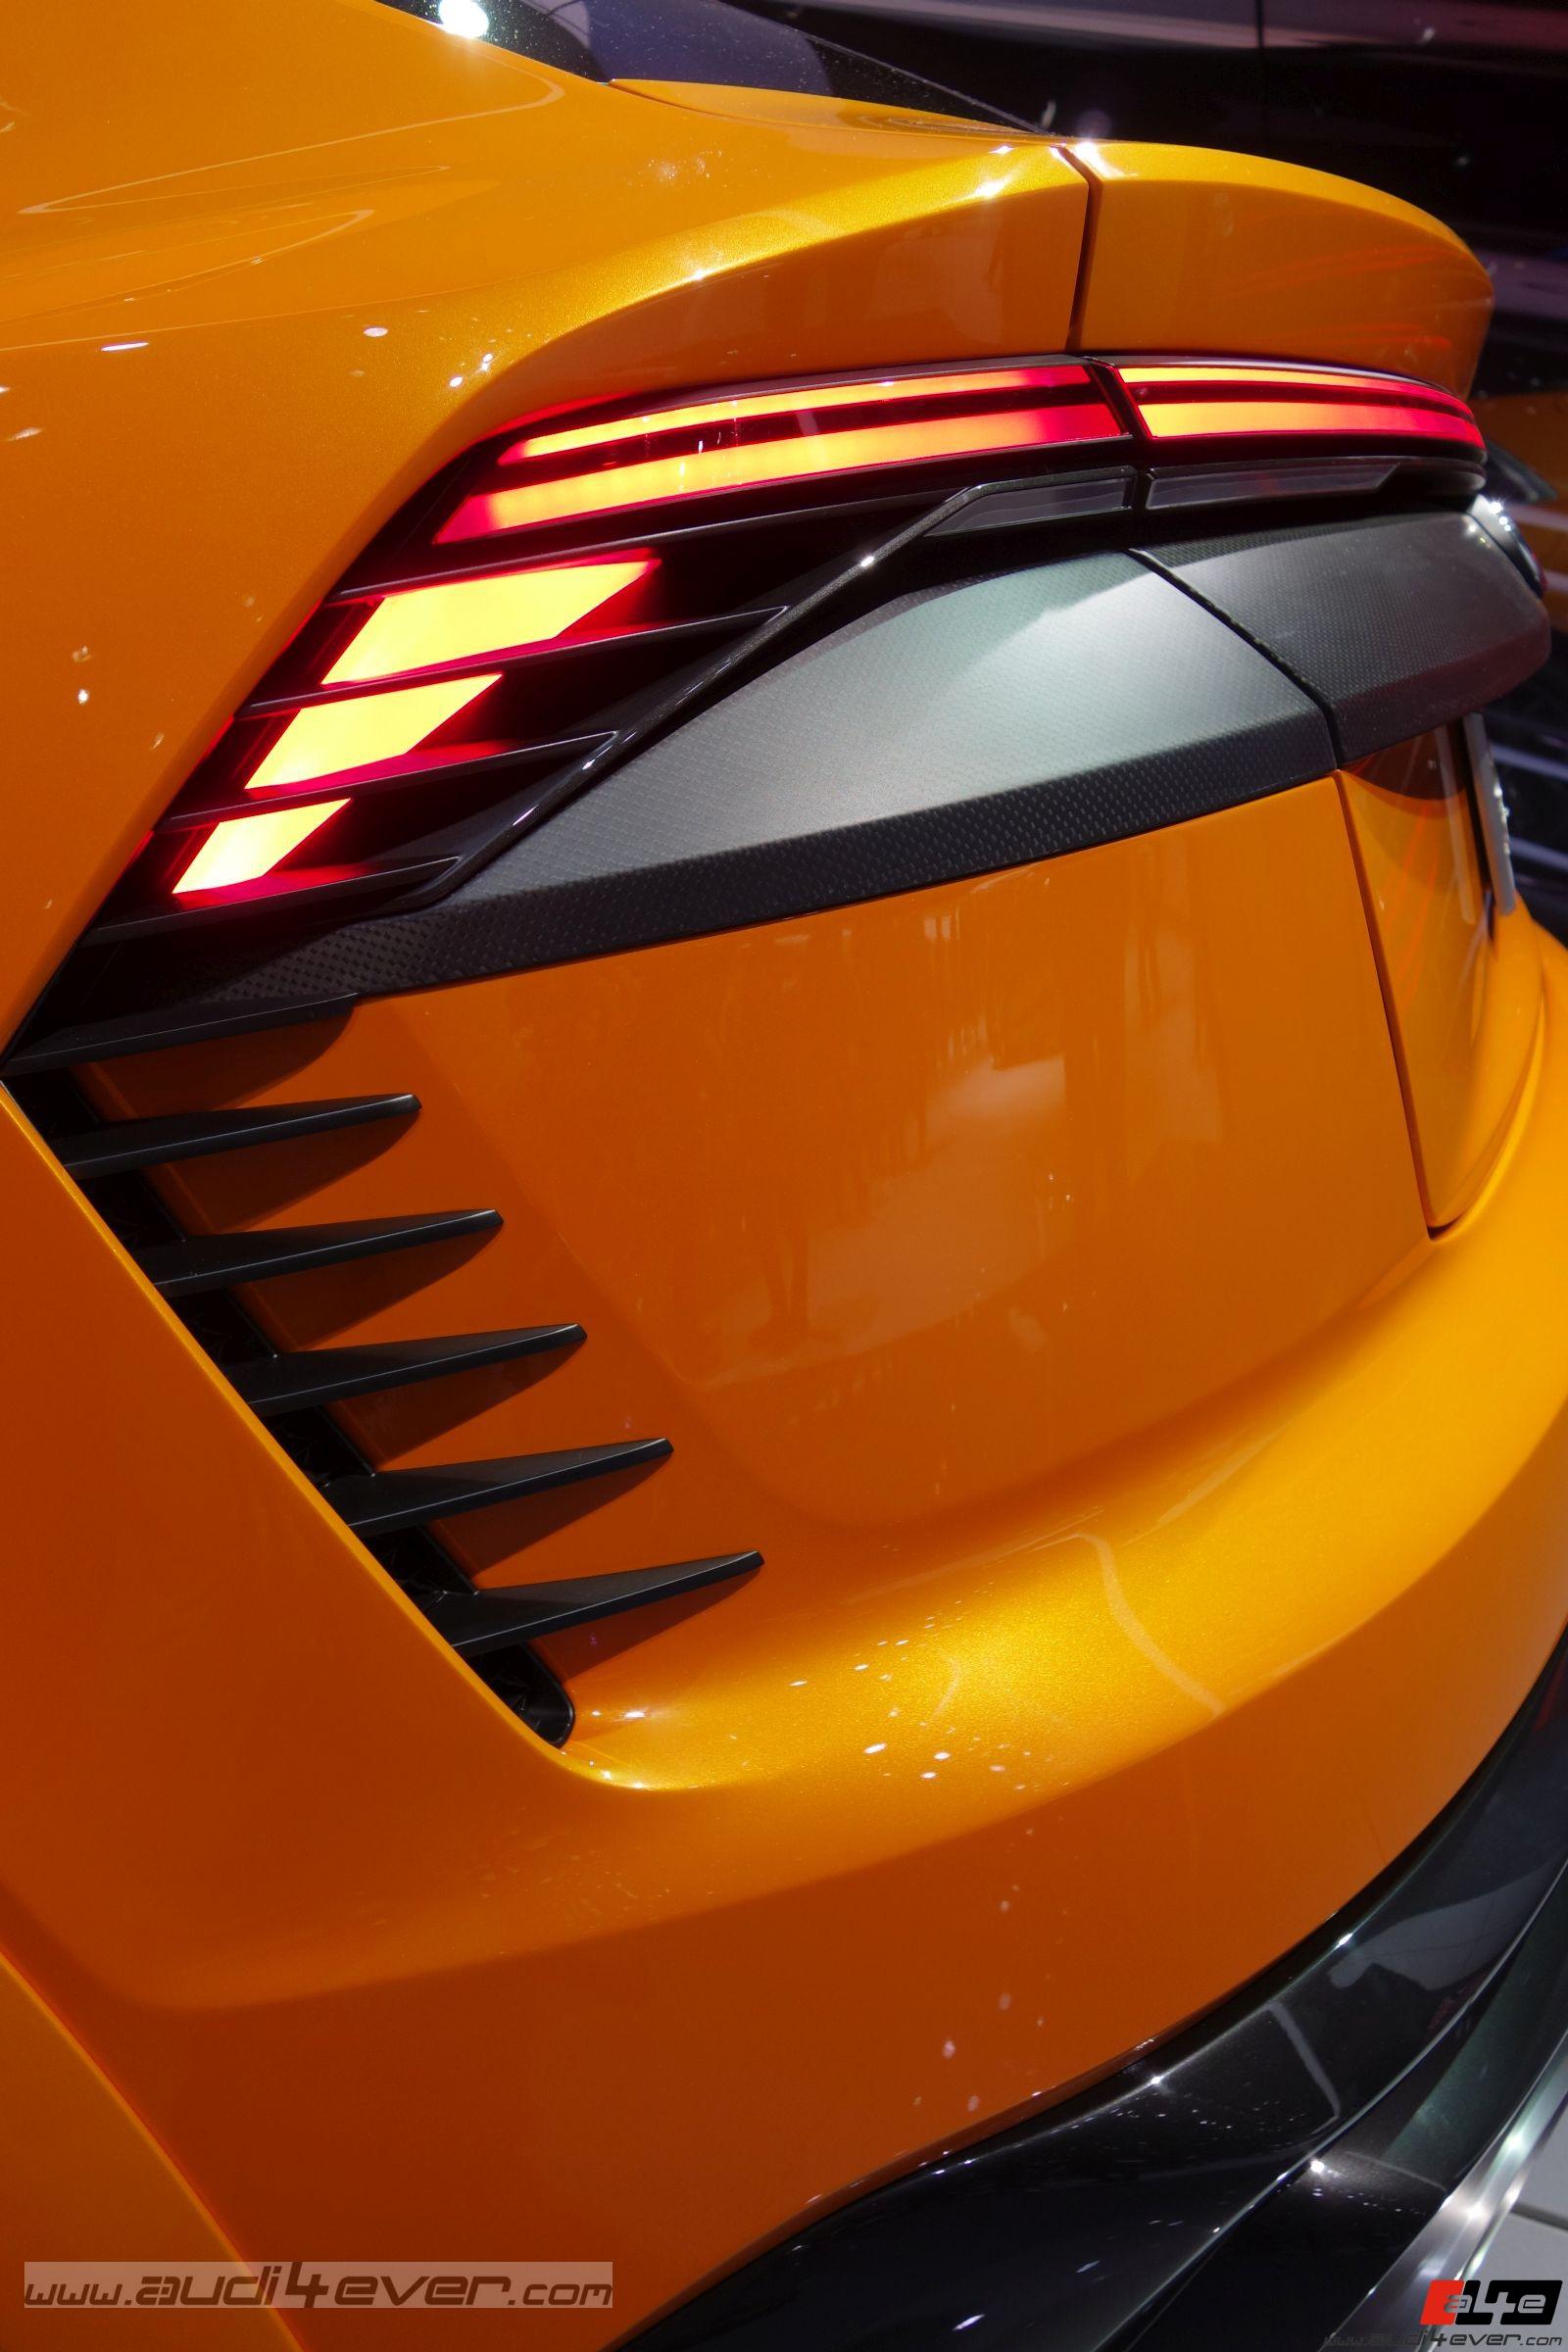 a4e - Gallery Audi Concept-Cars - Audi Q8 - 2018